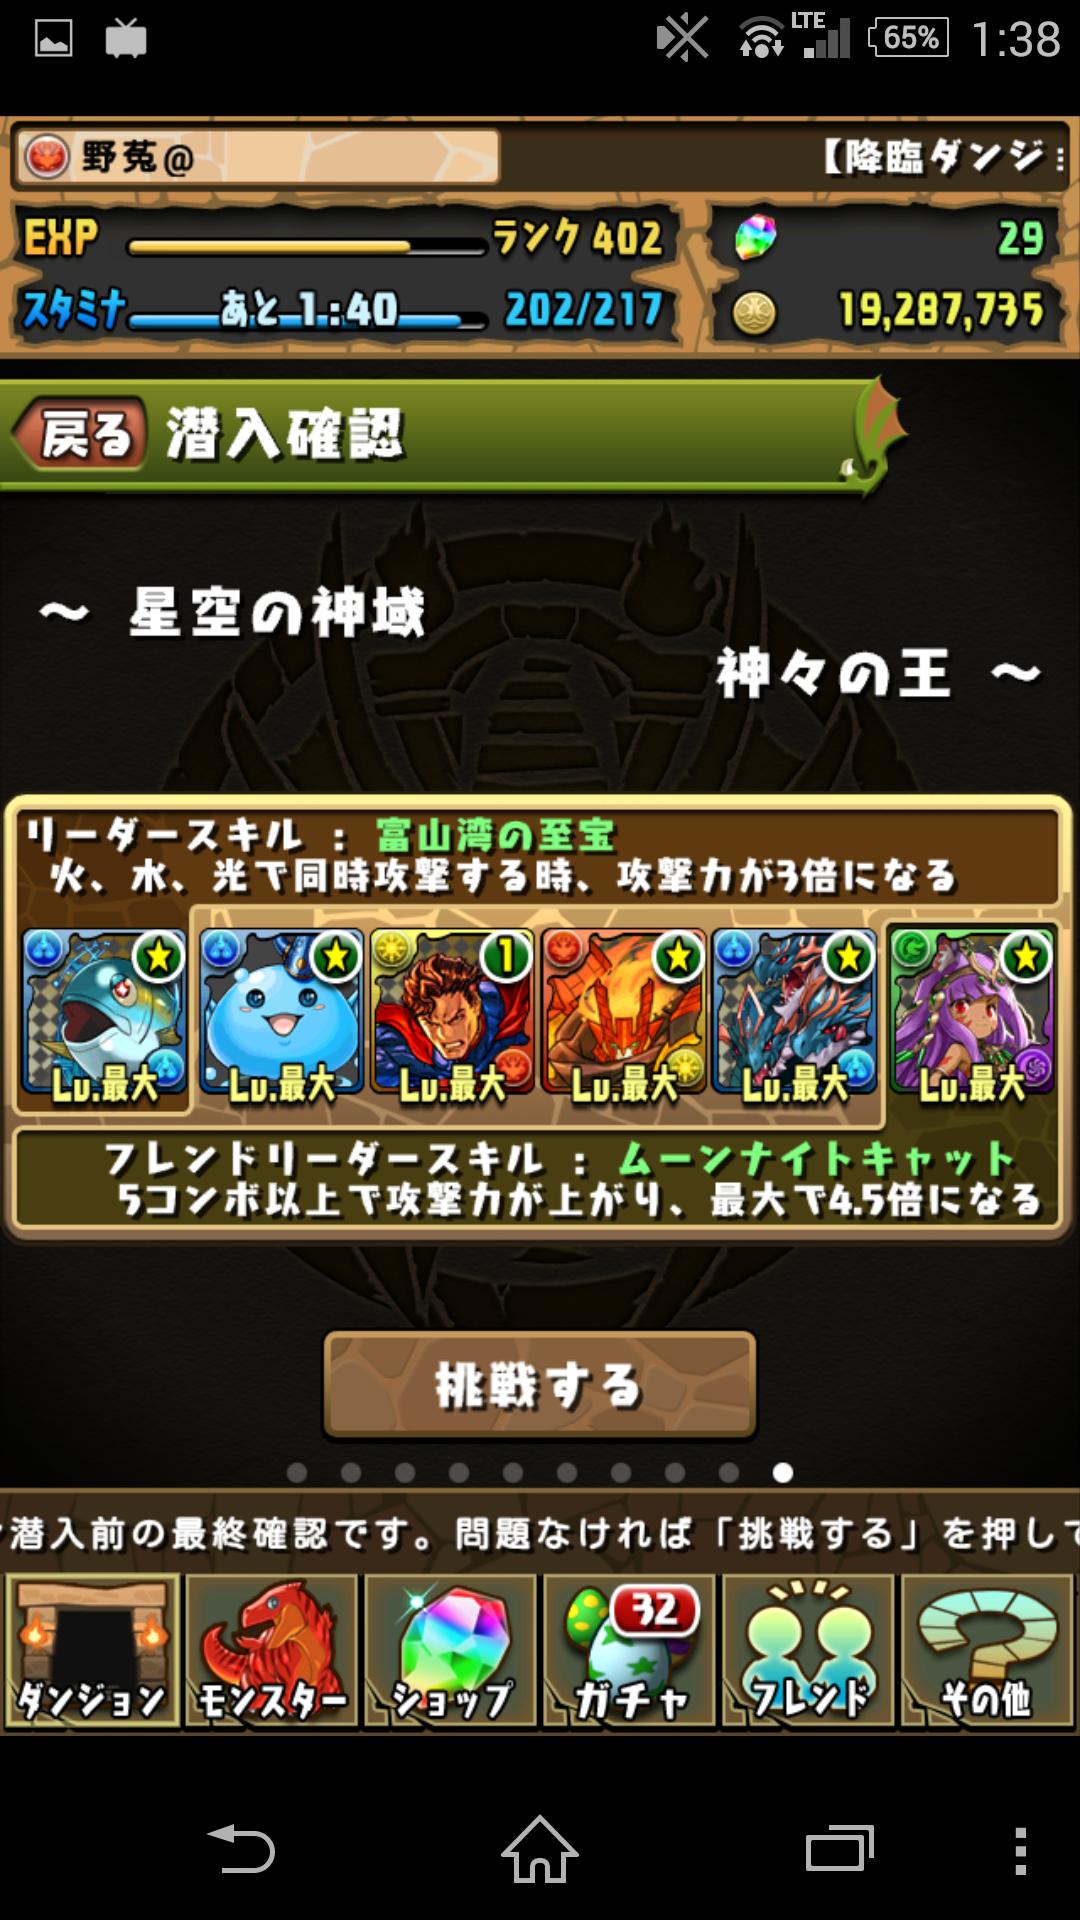 Screenshot_2014-11-13-01-38-46.png